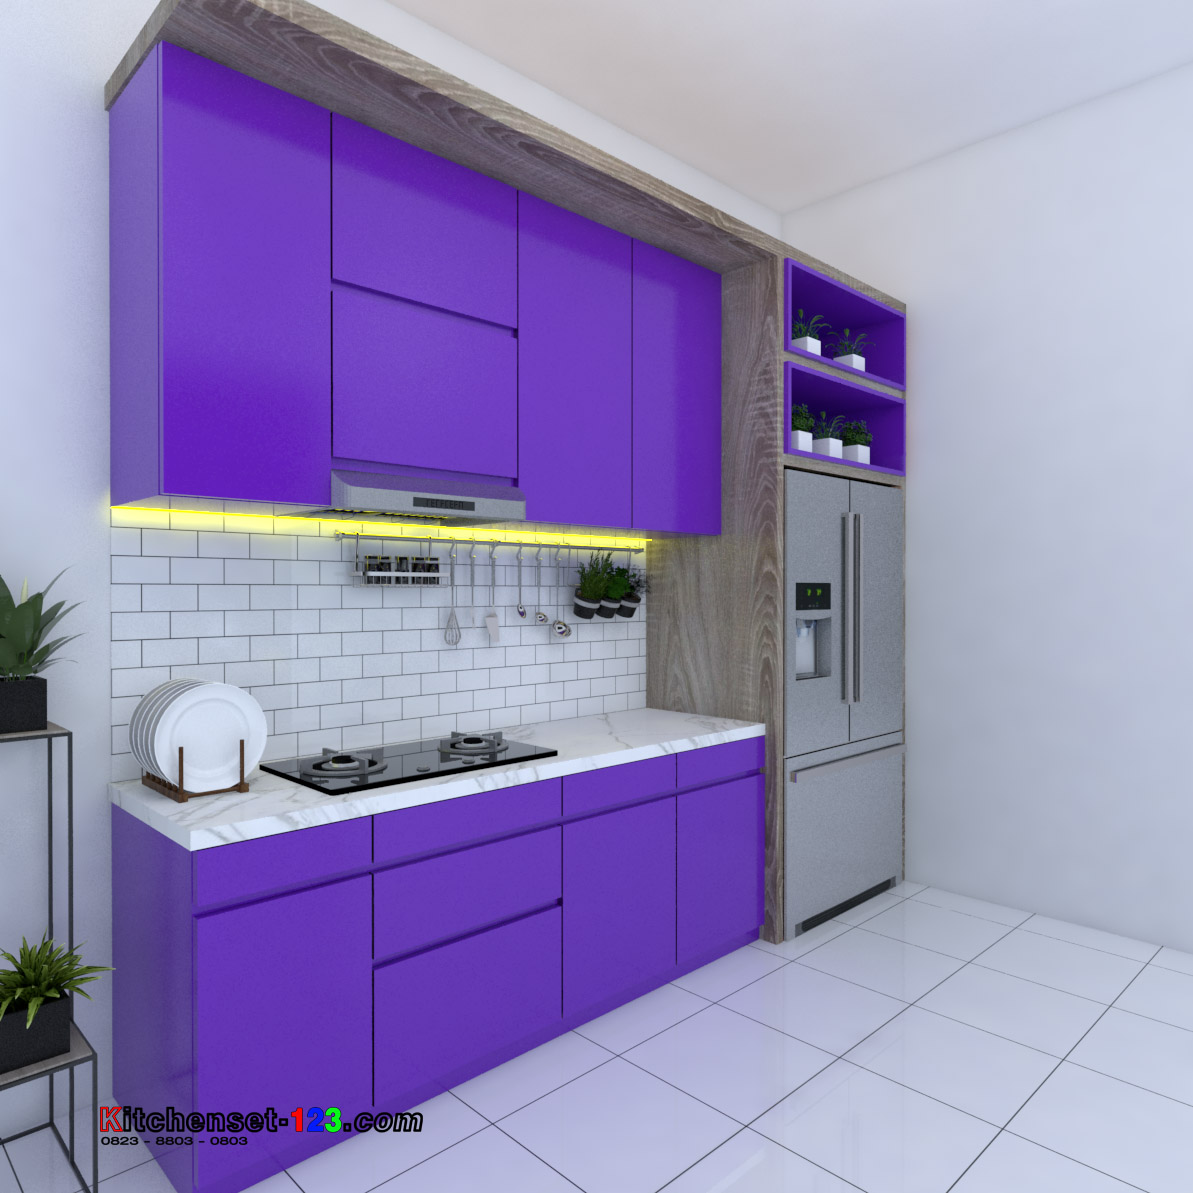 Kitchen set Murah Cabangbungin Bekasi